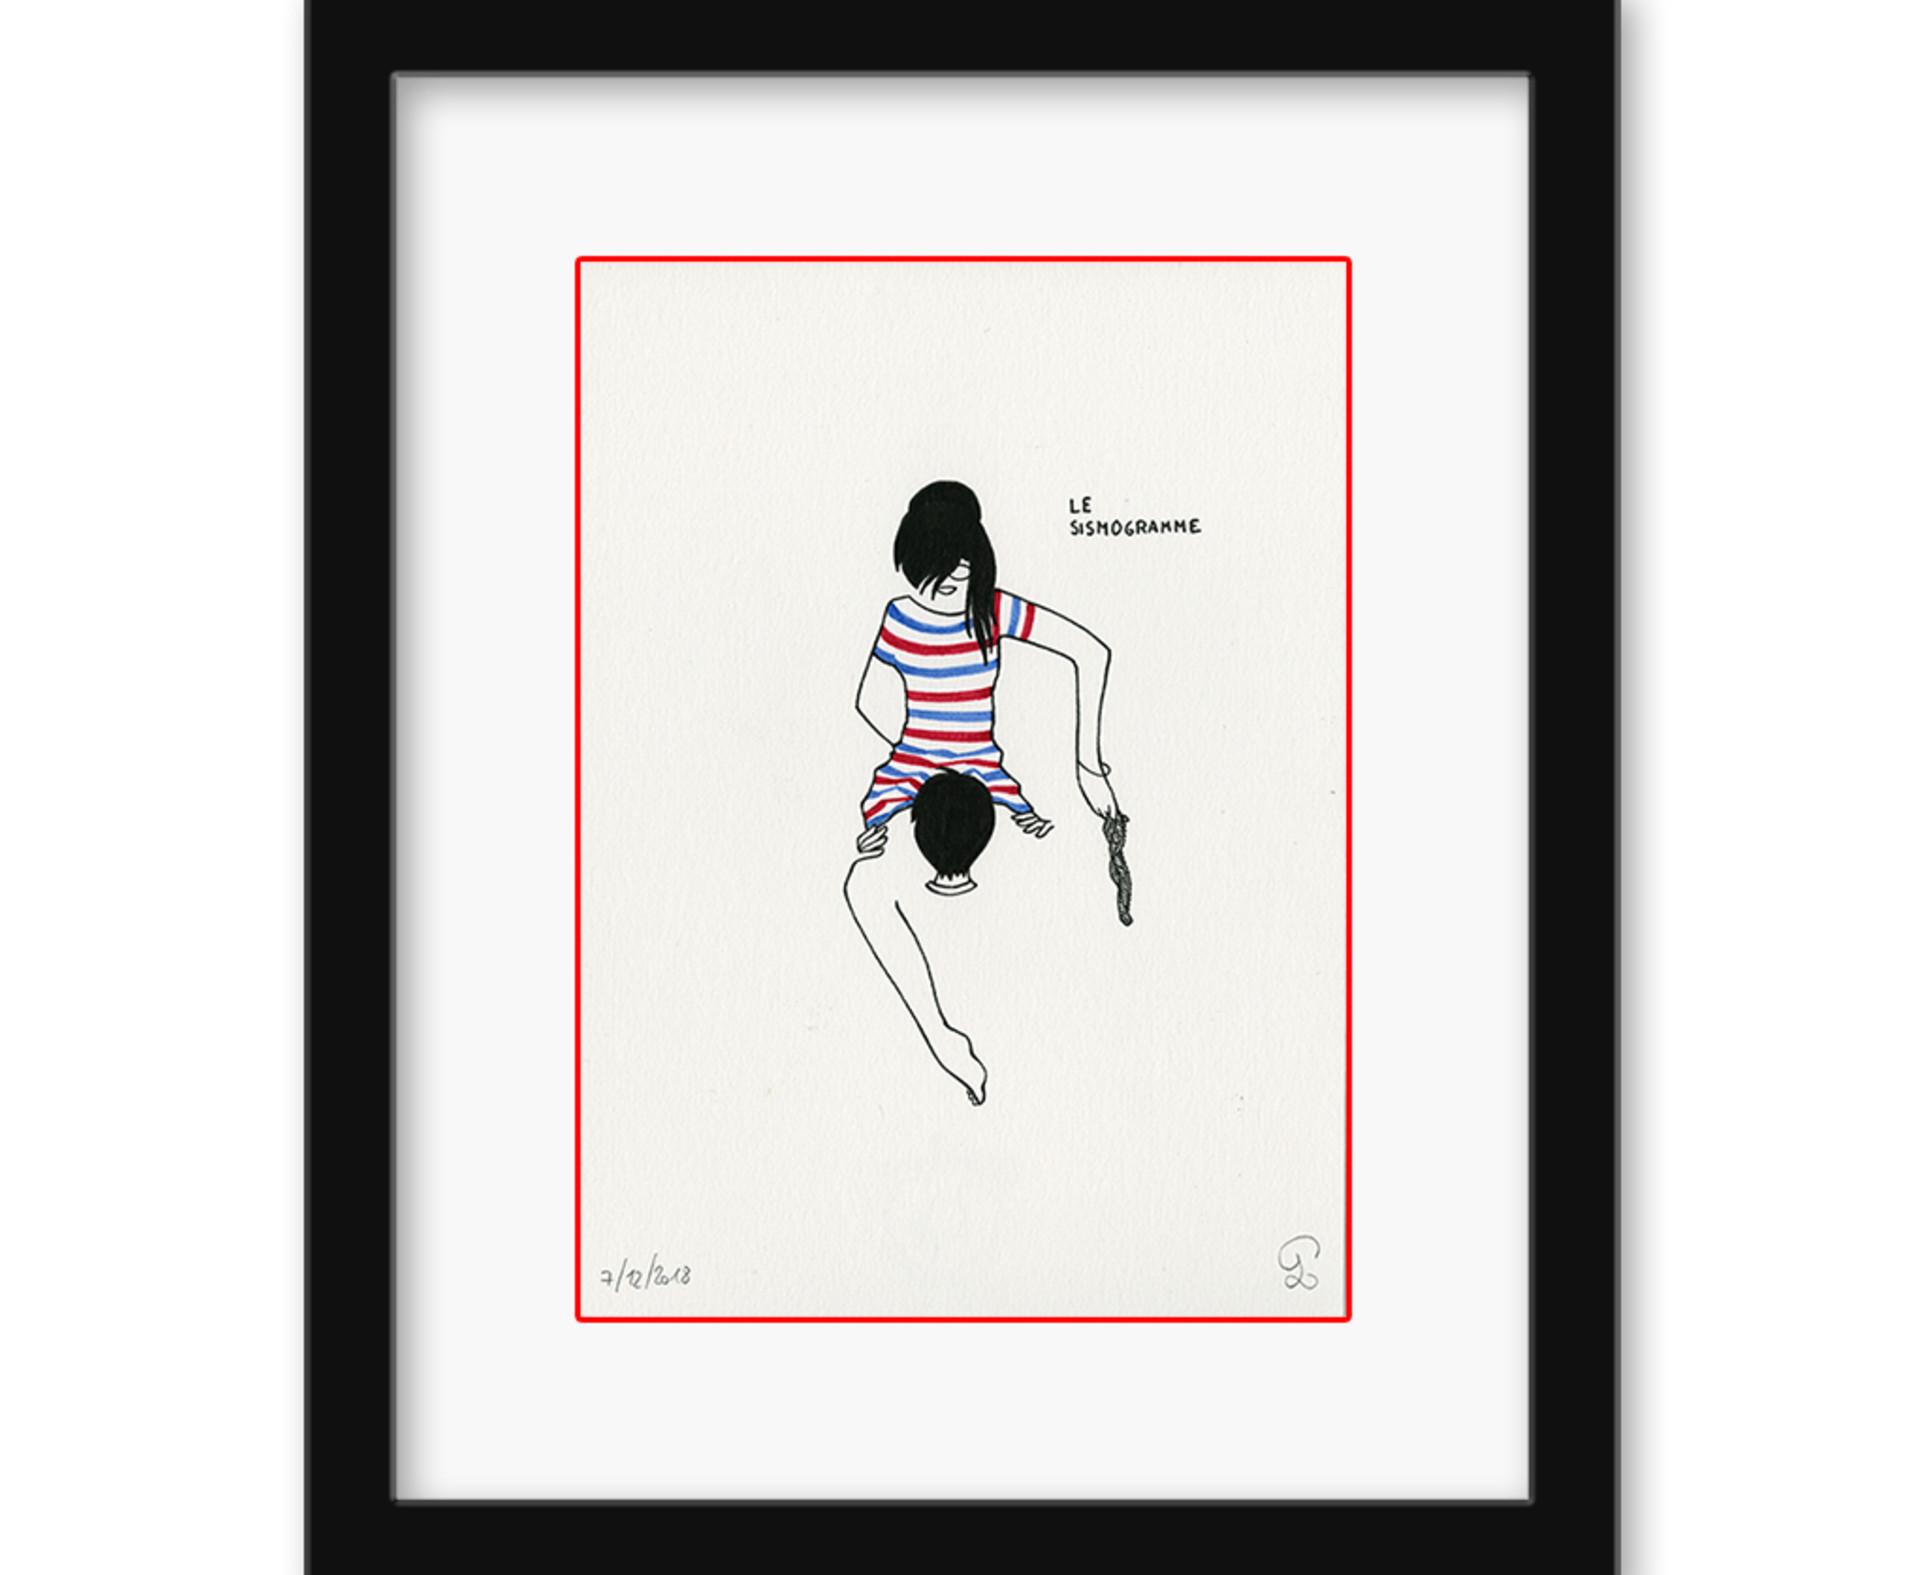 Petites Luxures, Le Sismogramme, 2018